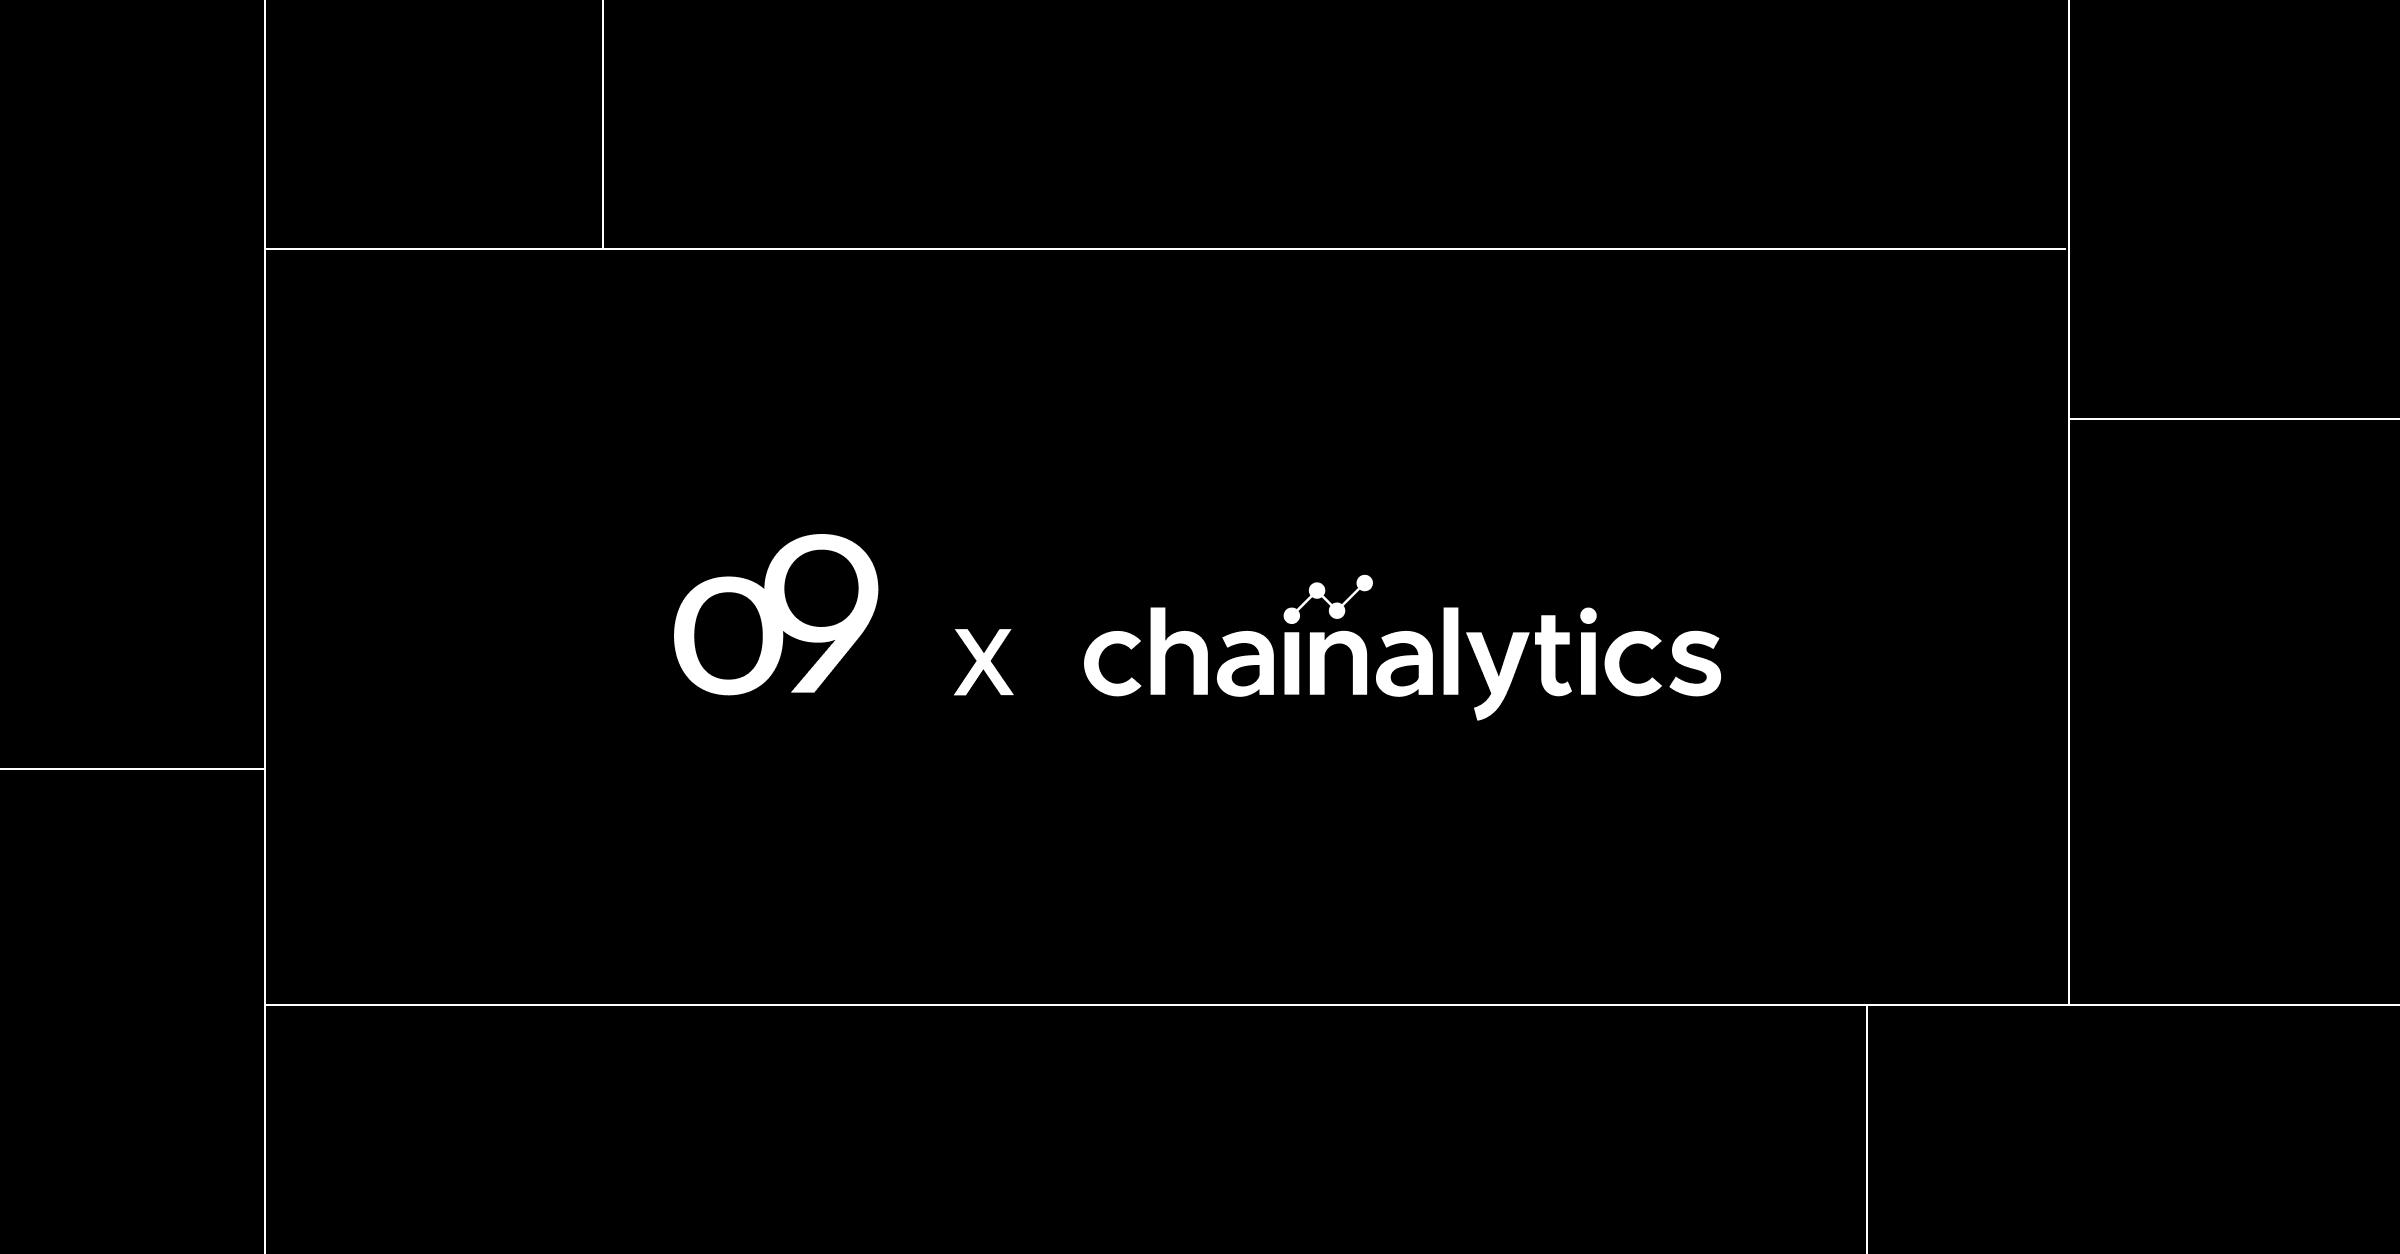 o9 announces strategic partnership with Chainalytics